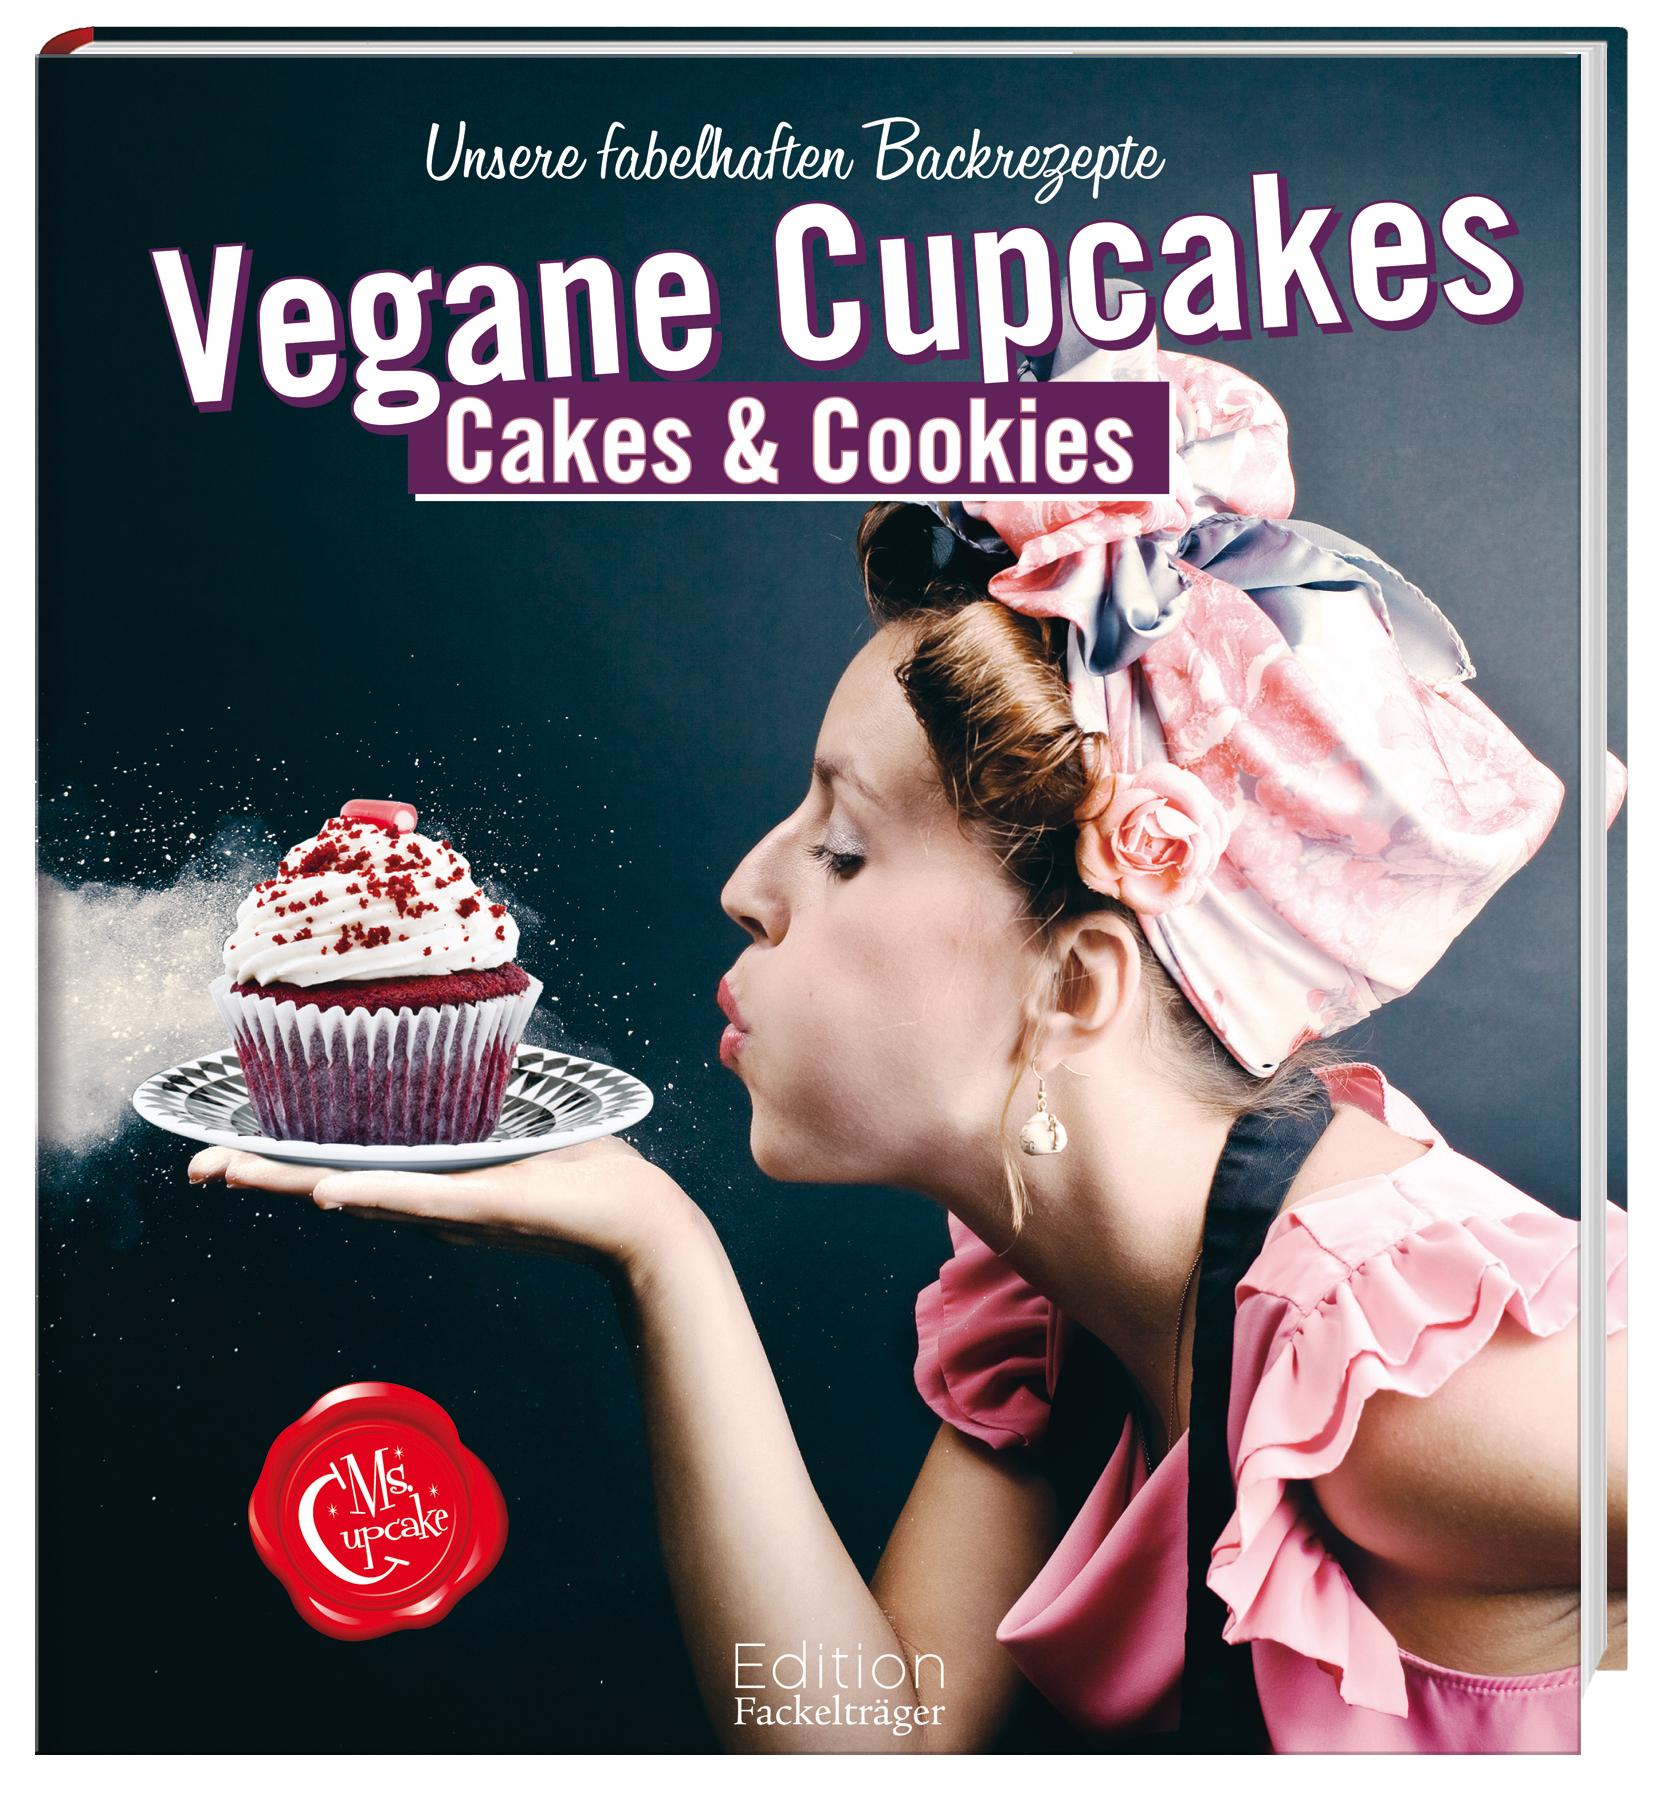 Vegane Cupcakes, Cakes & Cookies - Mellissa Morgan